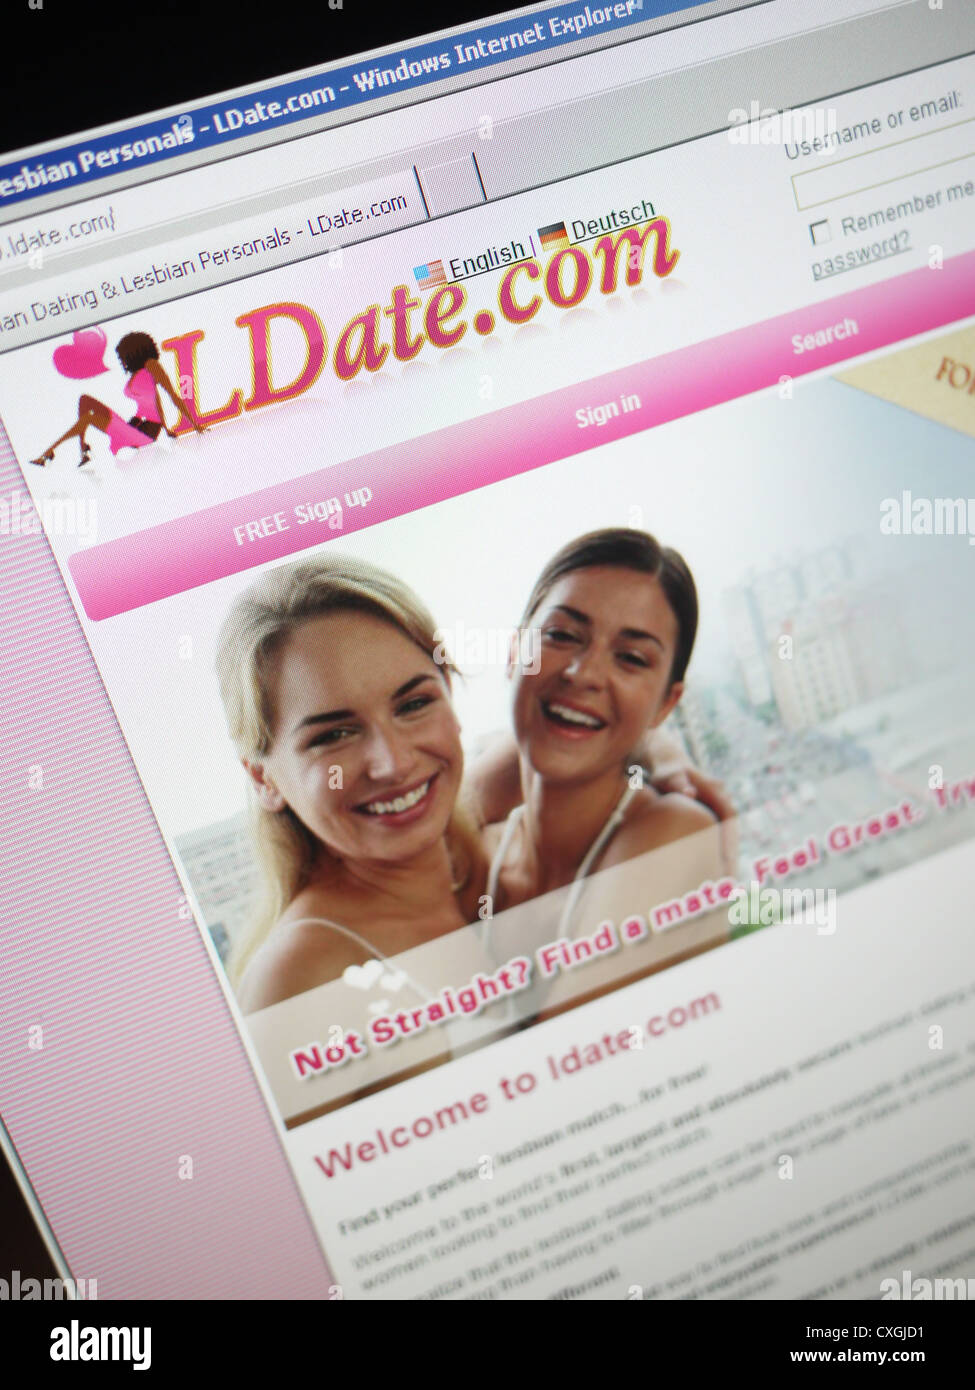 Ilmainen Lesbo dating site Englanti